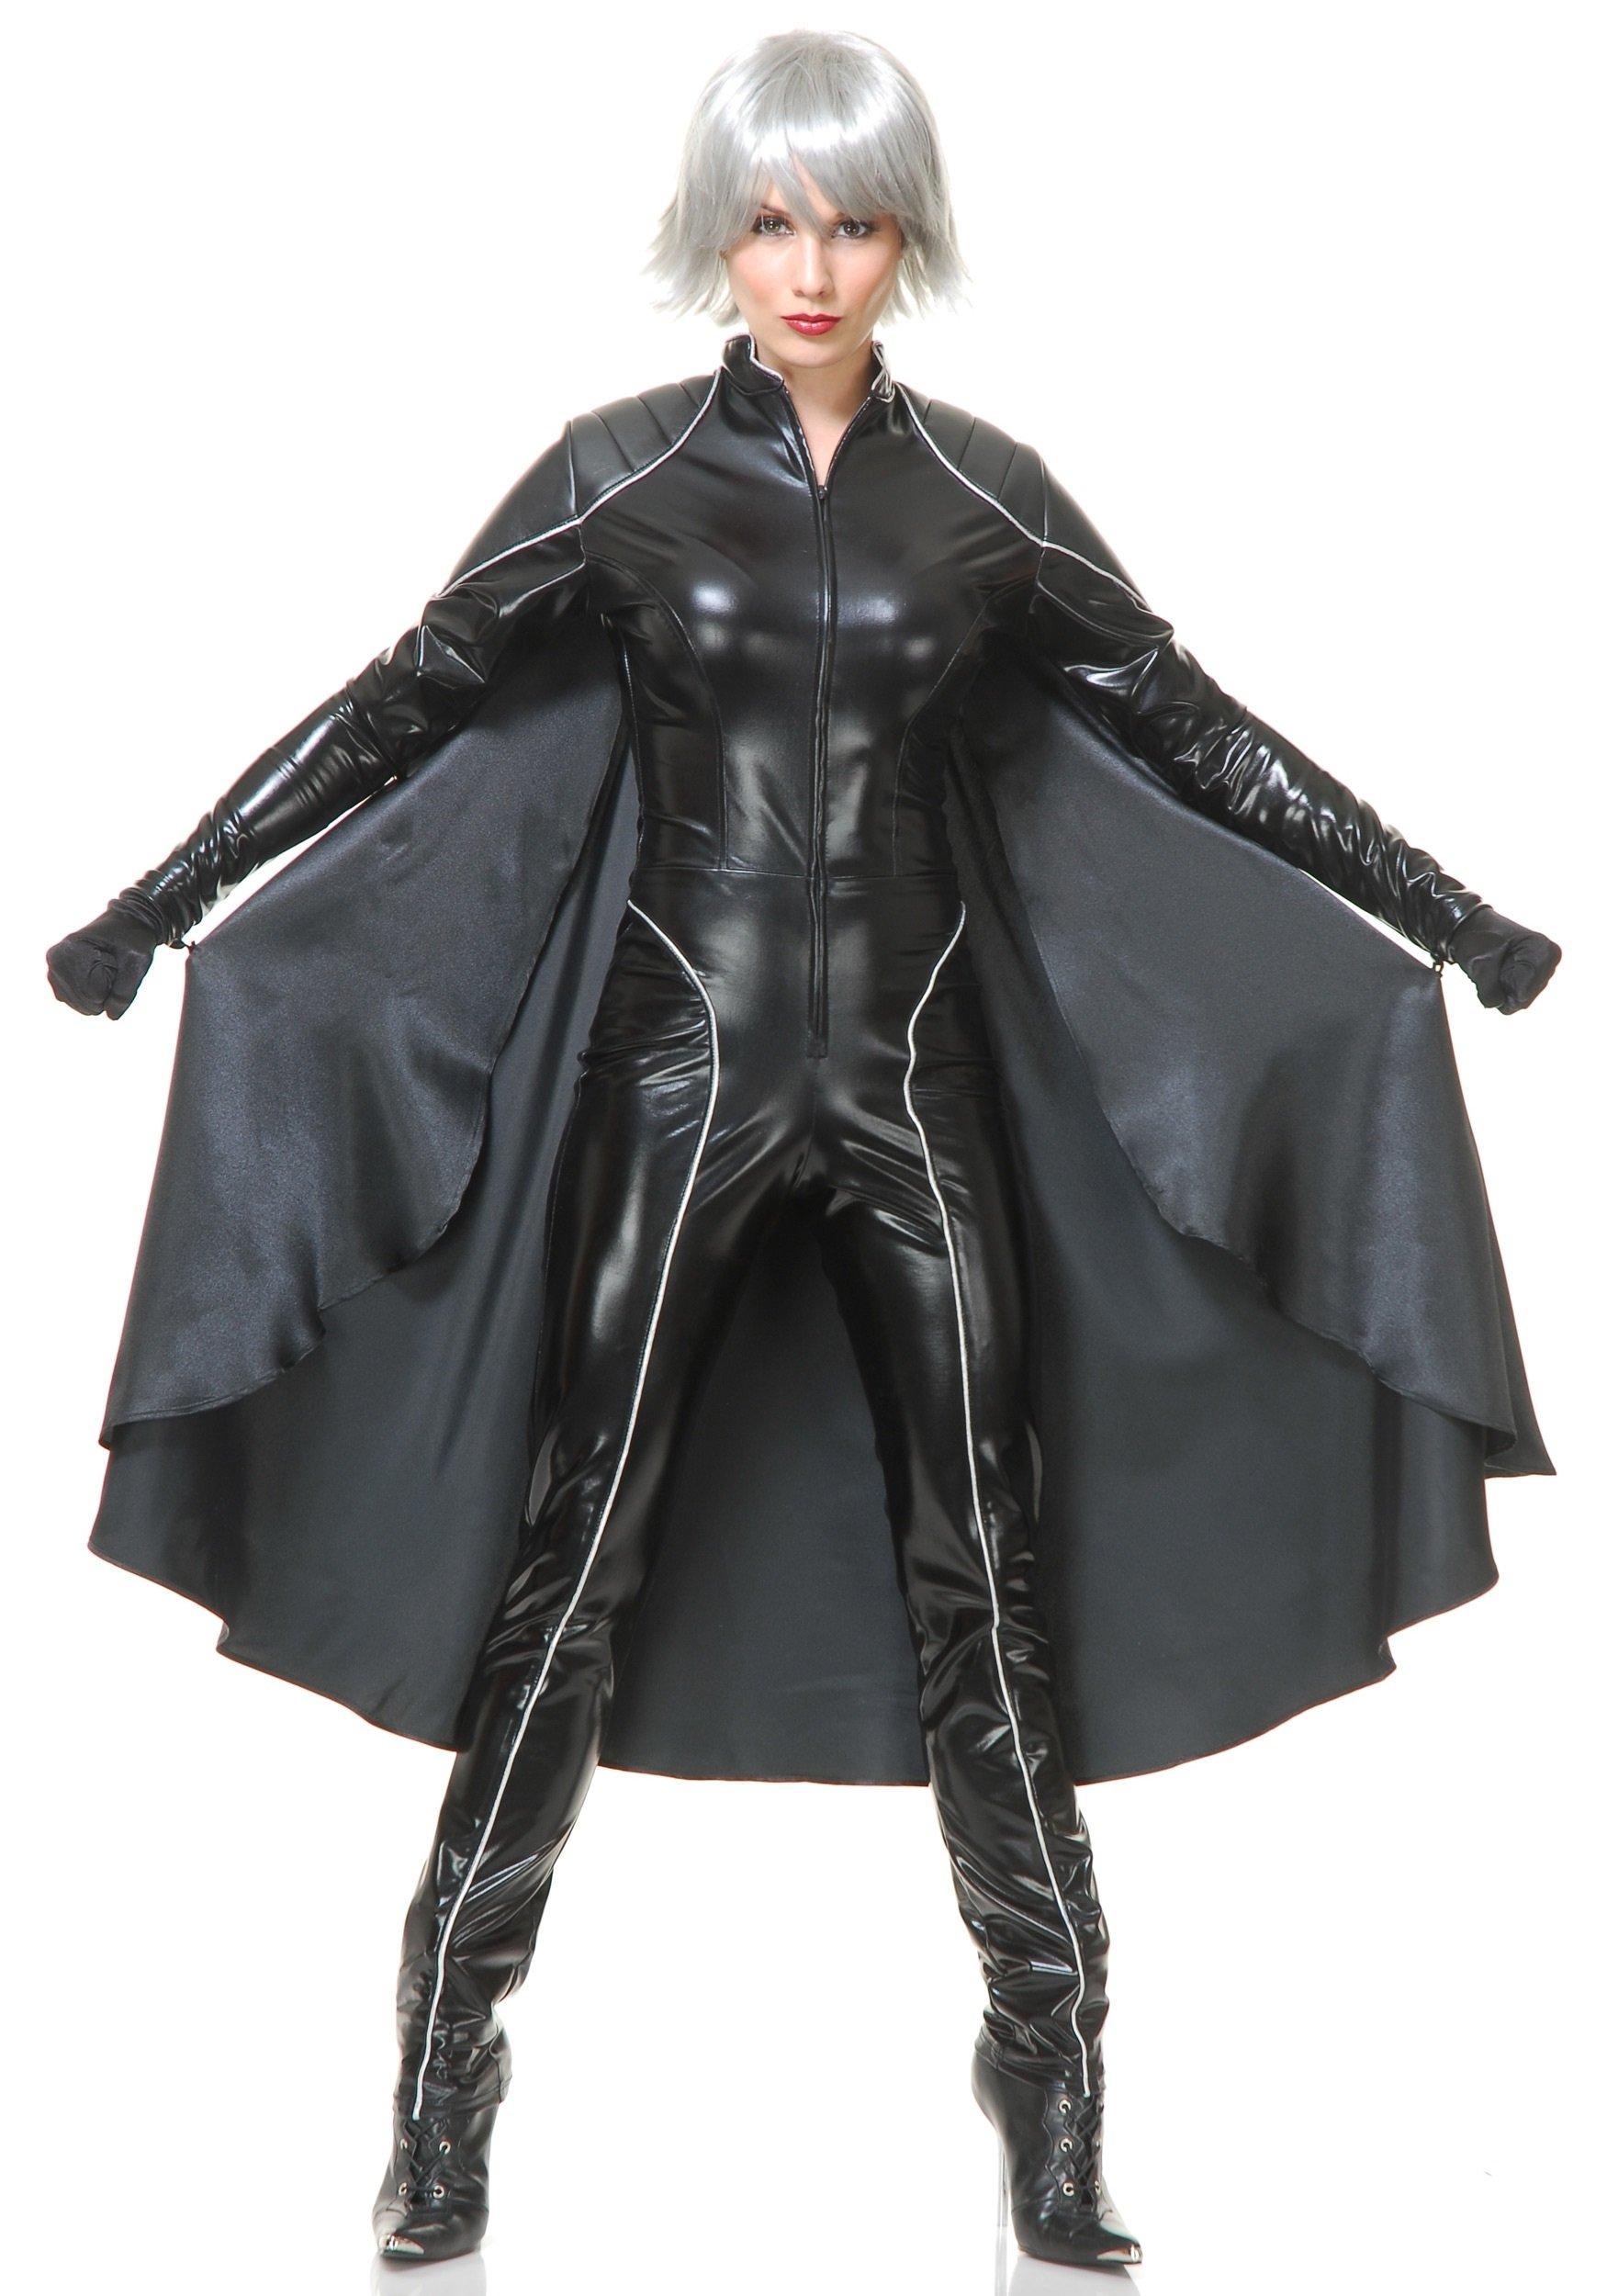 10 Stylish Superhero Costume Ideas For Women womens sexy thunder superhero costume womens superhero costume ideas 2020